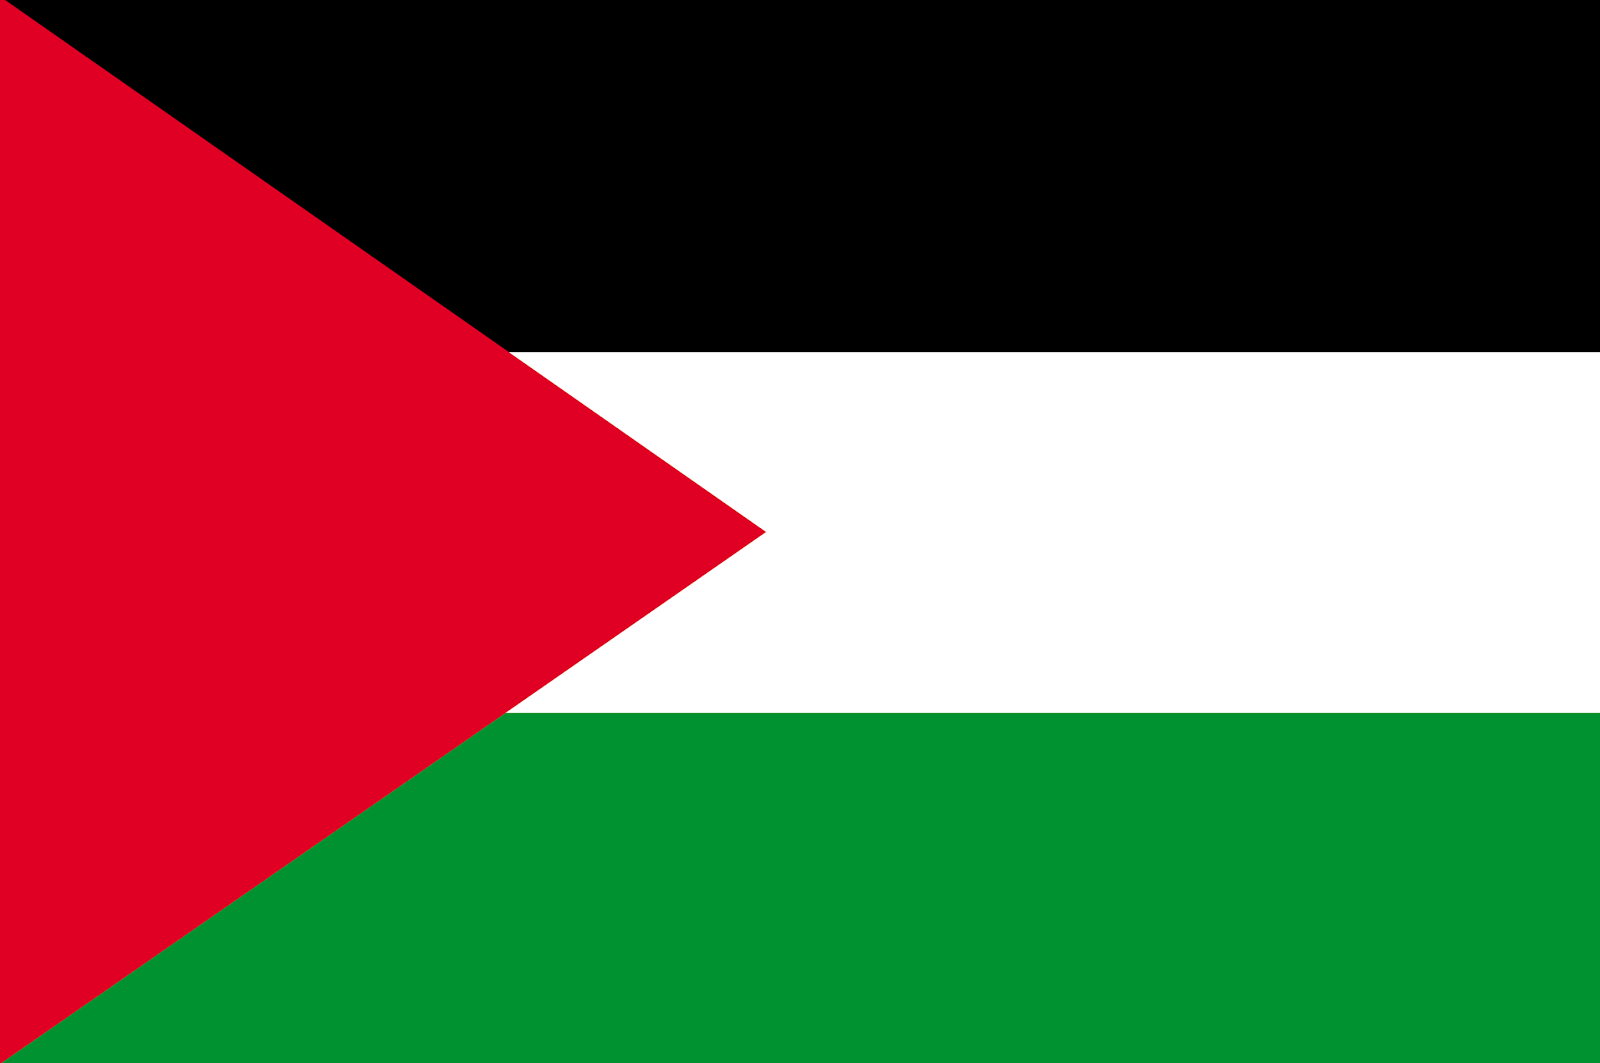 Palestine Flag Png image #38254